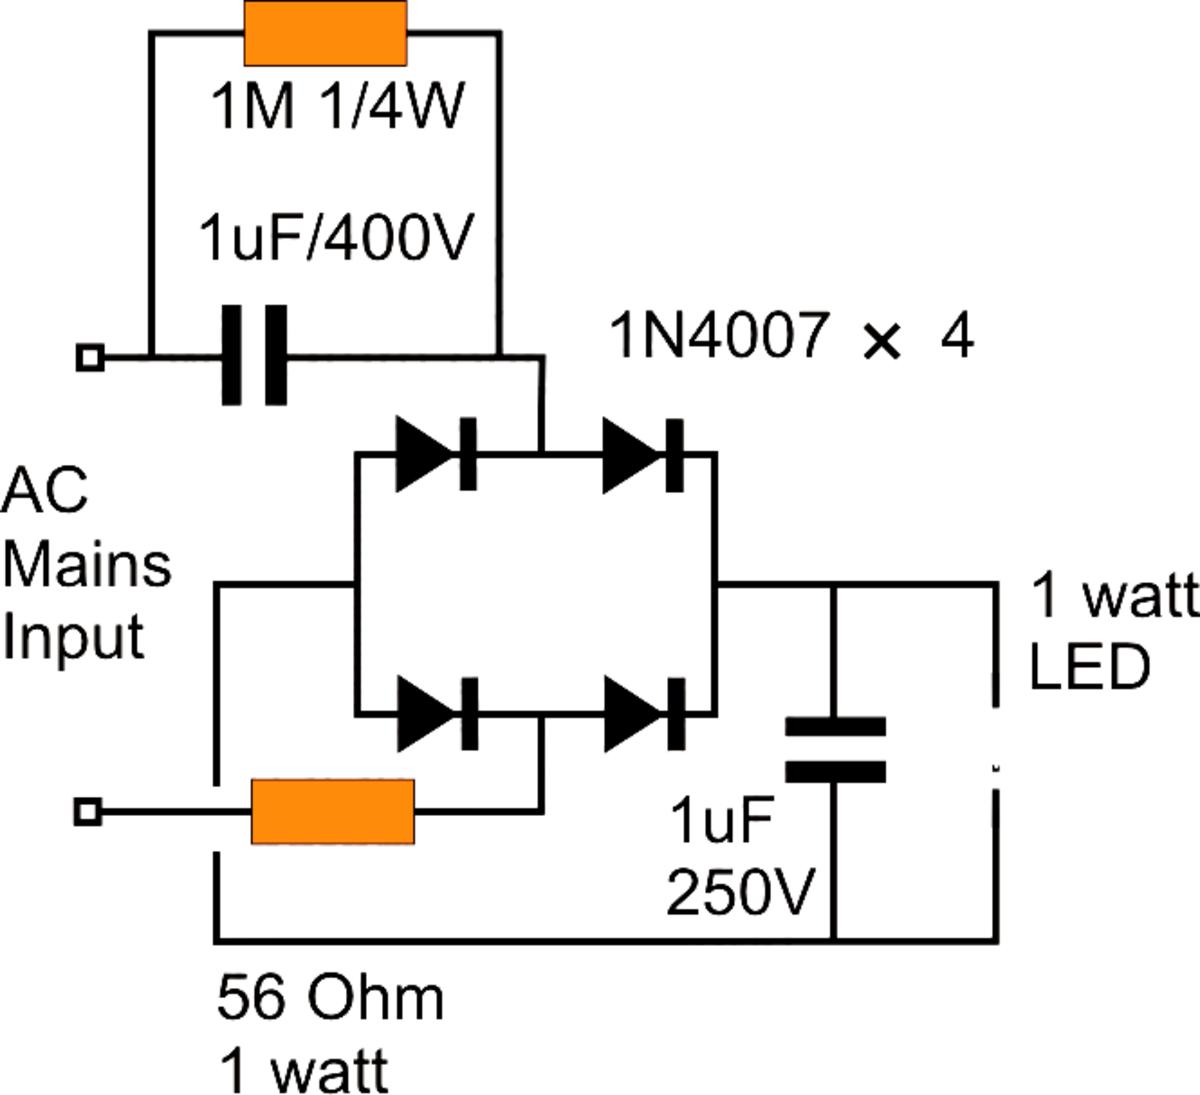 1 Watt Led Circuit Diagram | Making A 1 Watt Led Driver Circuit At 220v Hubpages